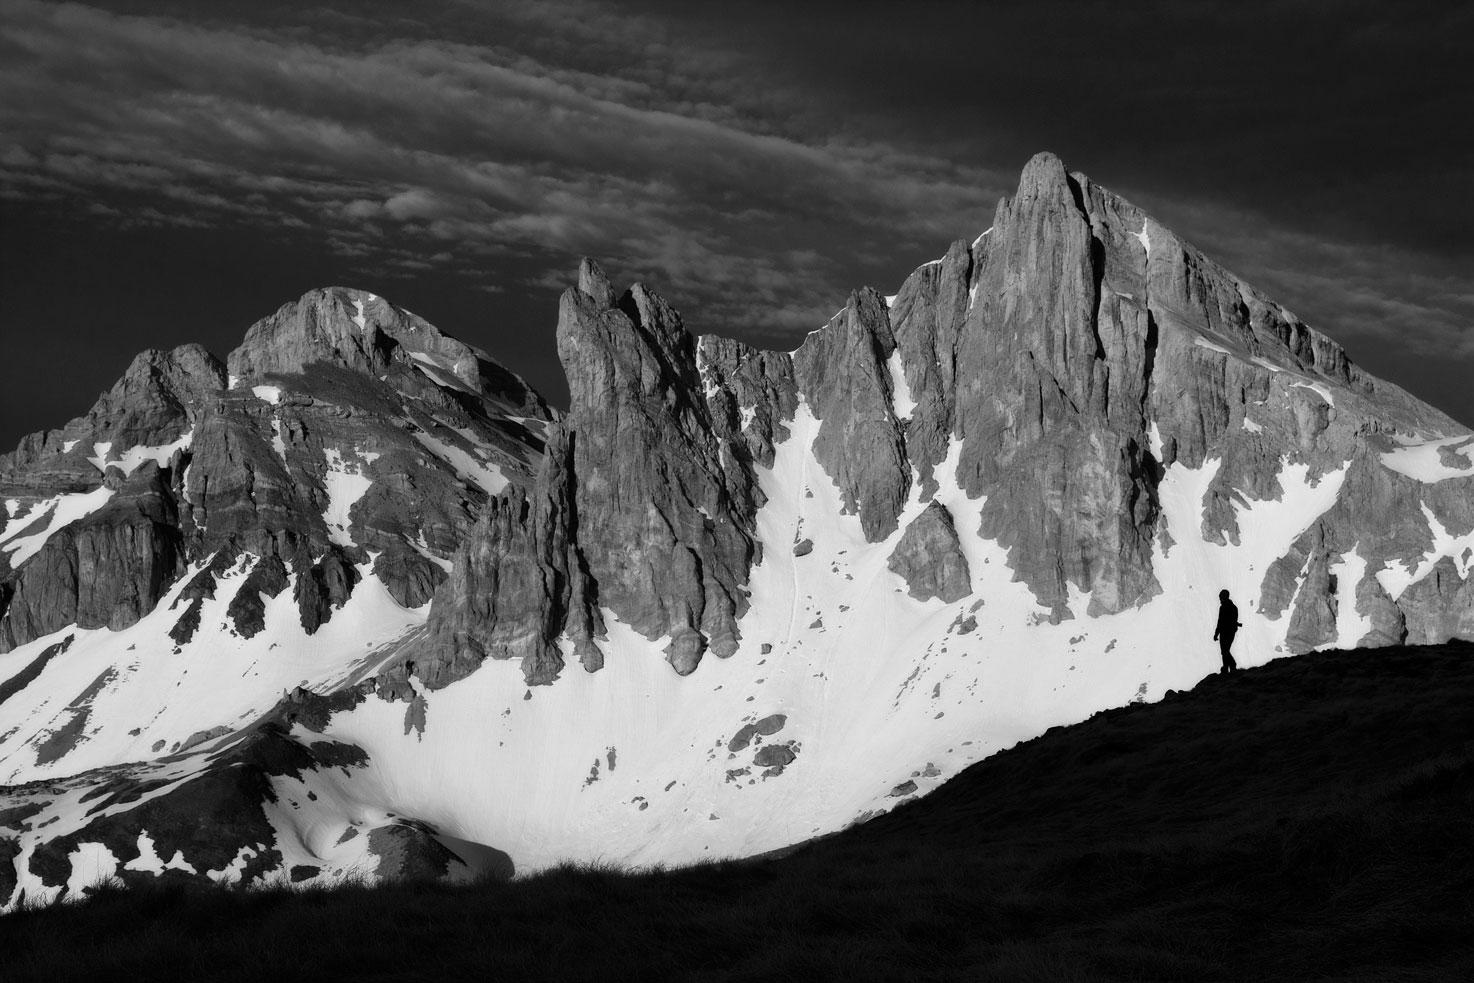 Deportes y aventuras - Inaki Larrea, Nature and mountains Photography